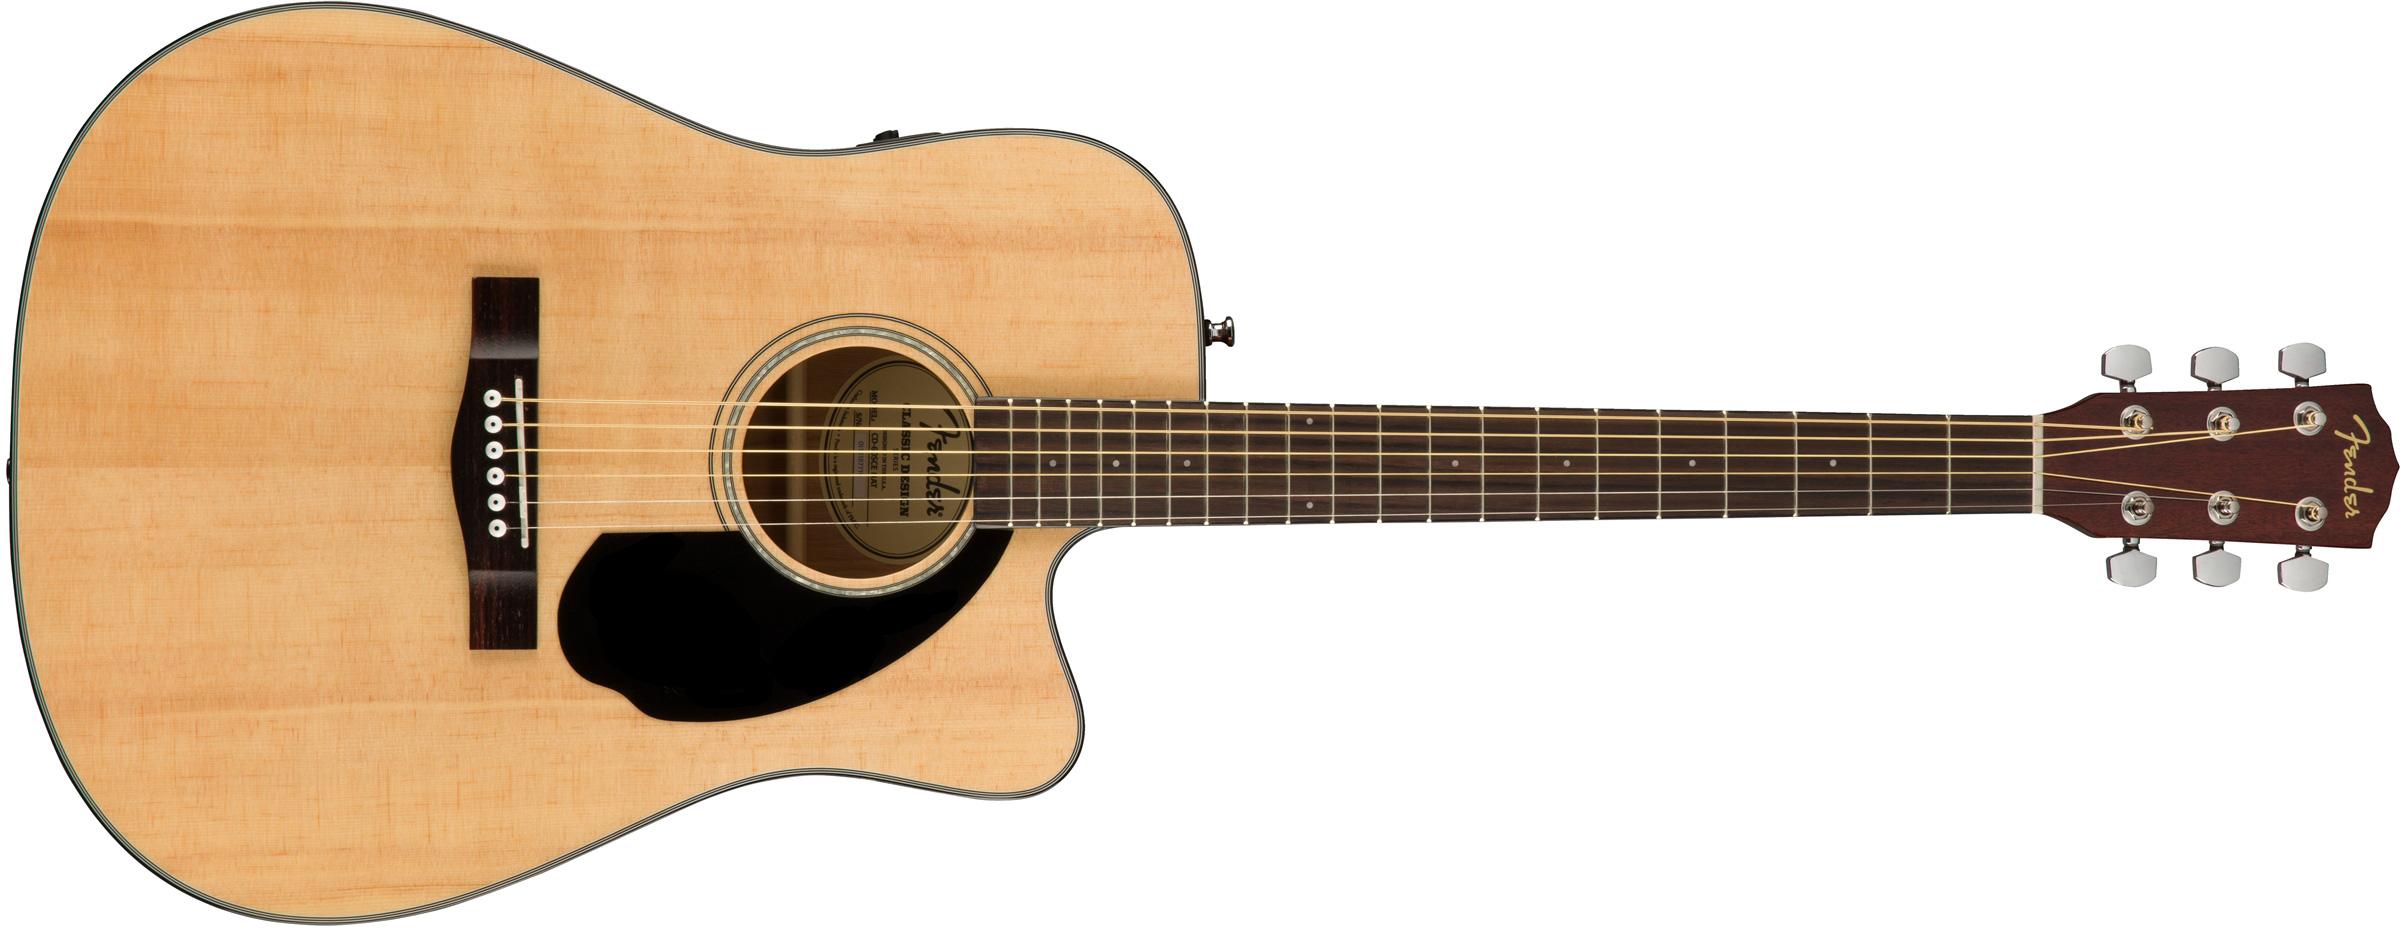 Fender Cd 60sce Natural Elektro Akustik Gitar Mydukkan